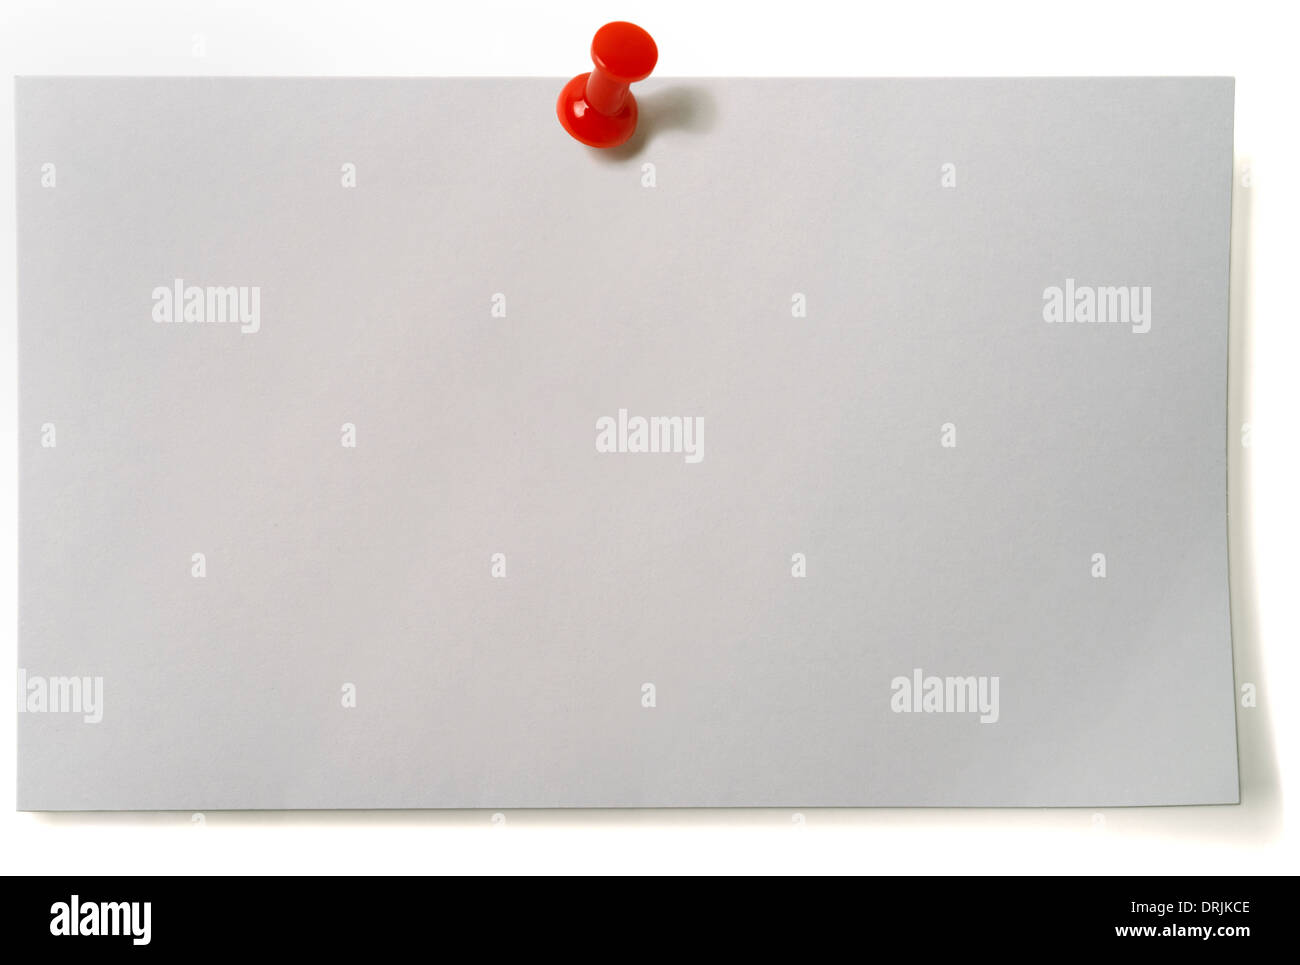 Index Card - Stock Image